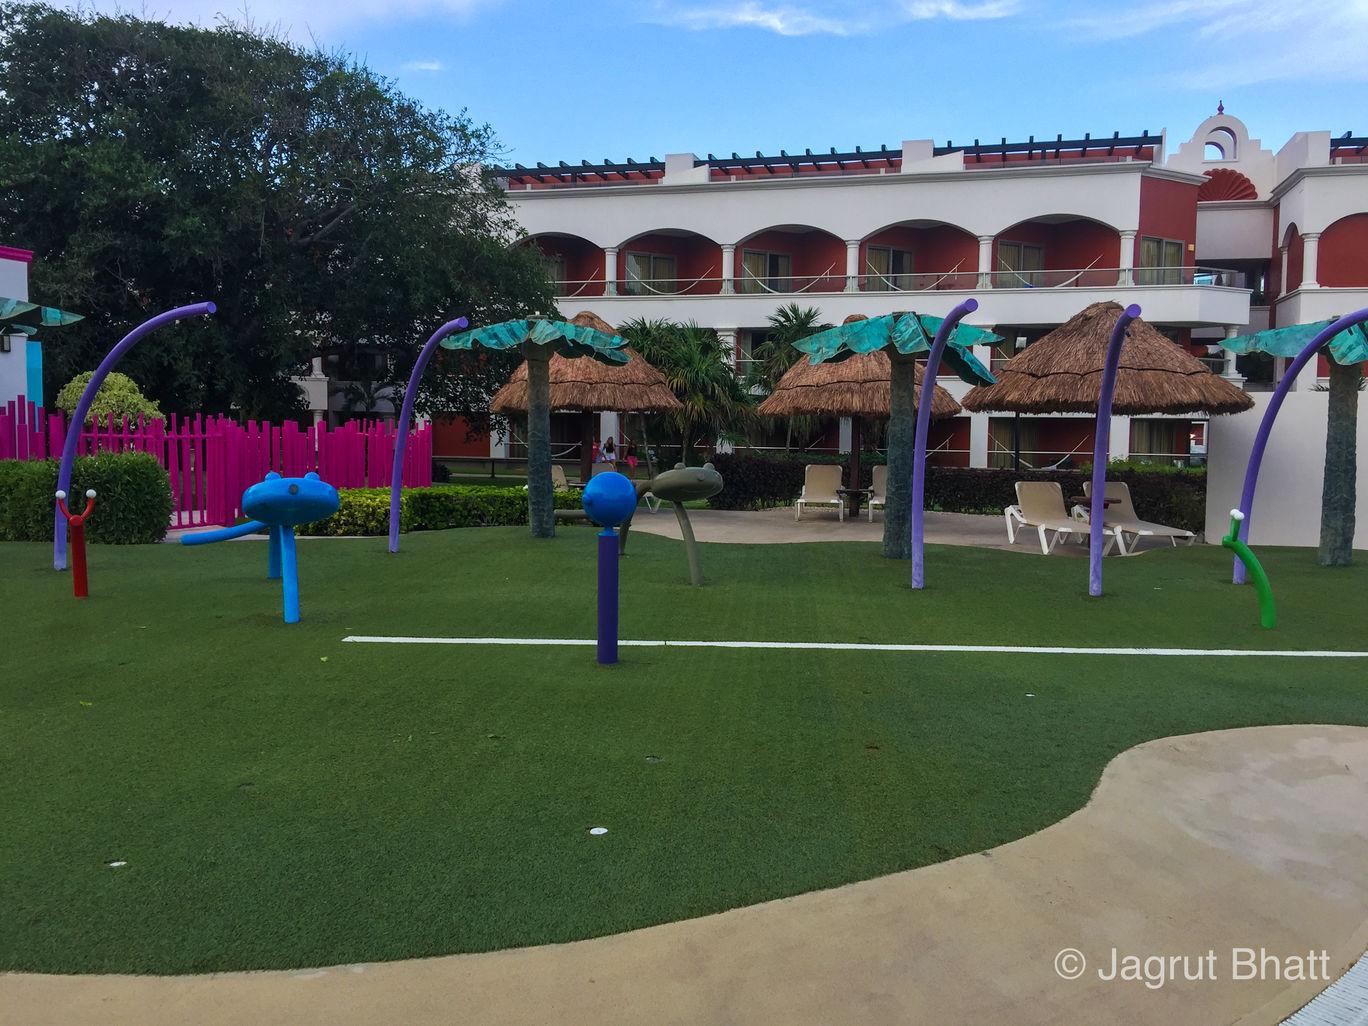 Photo of Hard Rock Hotel Riviera Maya By jagrut bhatt